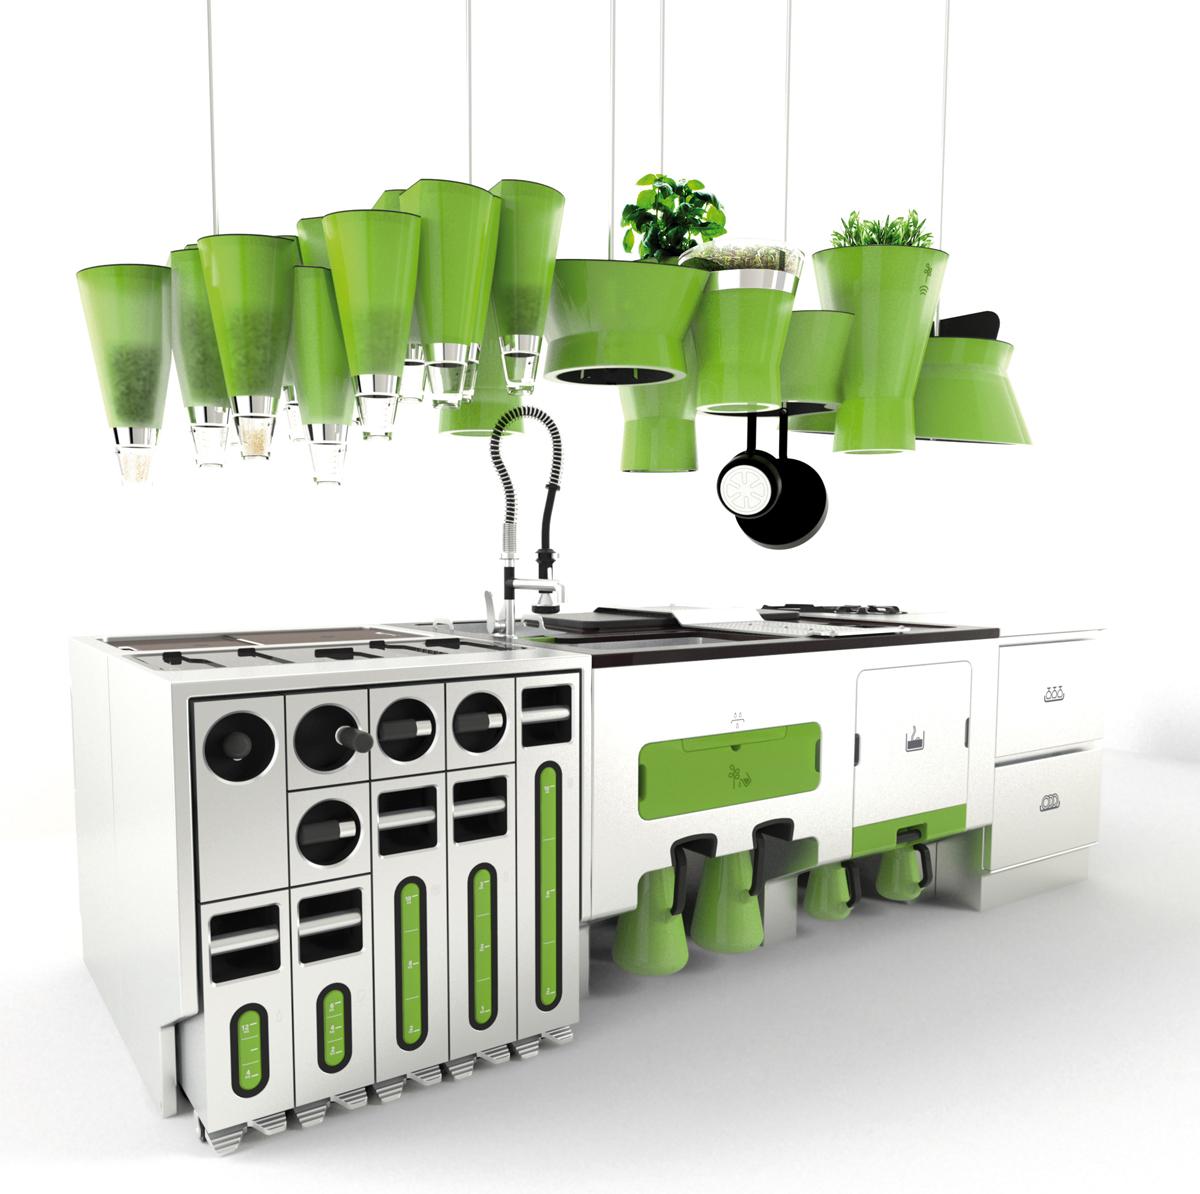 Environmentally Friendly Kitchen Cabinets: Eco-Friendly Futuristic Kitchen